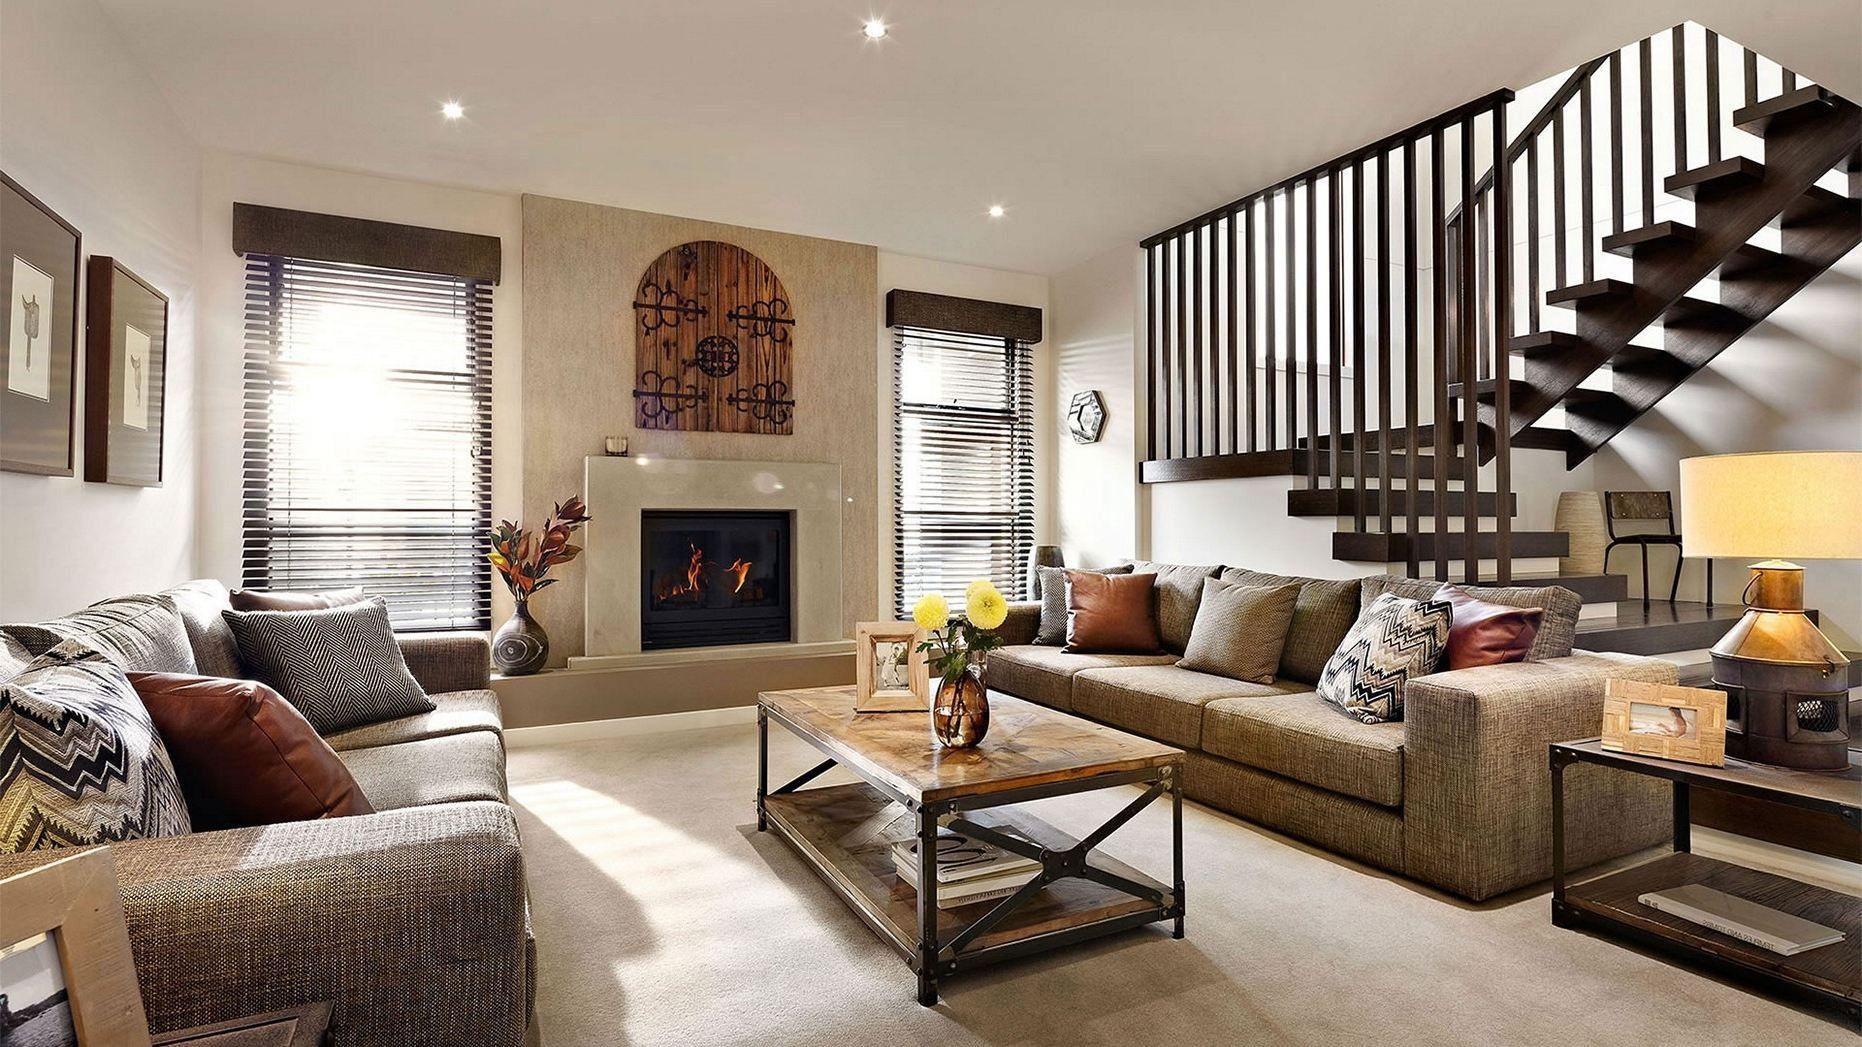 30 Awesome Rustic Italian Living Room Ideas  Italian Living Room Simple Italian Living Room Design Inspiration Design